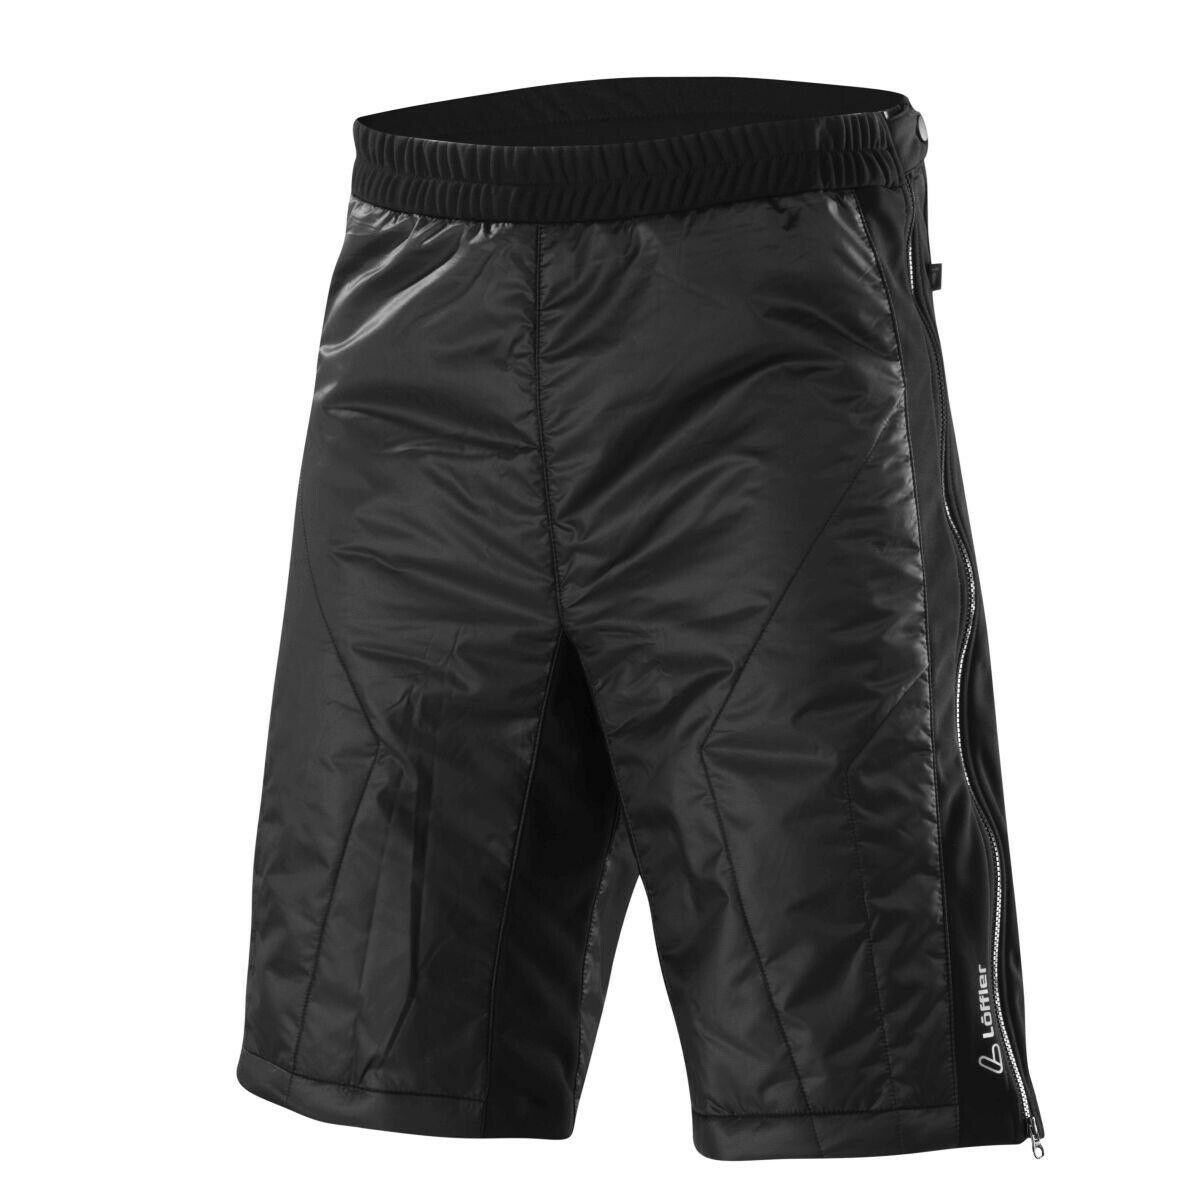 Löffler Shorts Primaloft Mix Funktionshose kurz schwarz